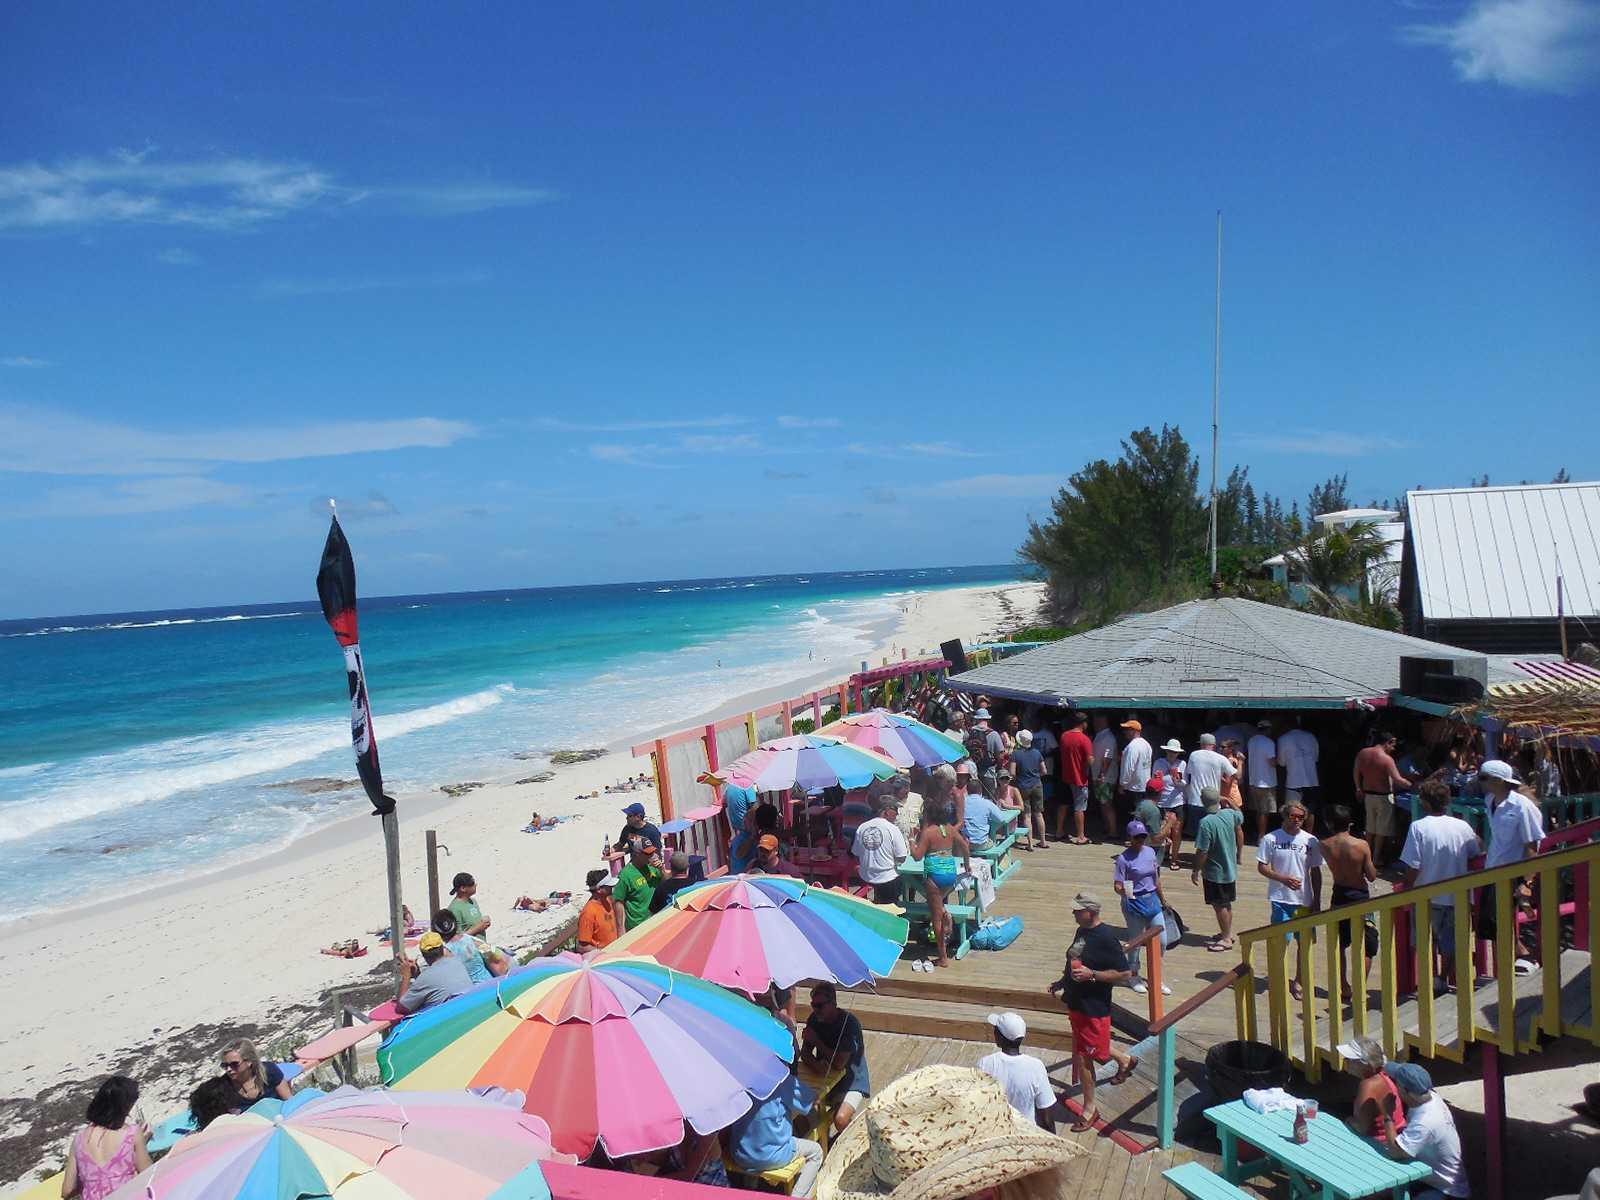 Nipper's Bar on Guana Cay in the Bahamas